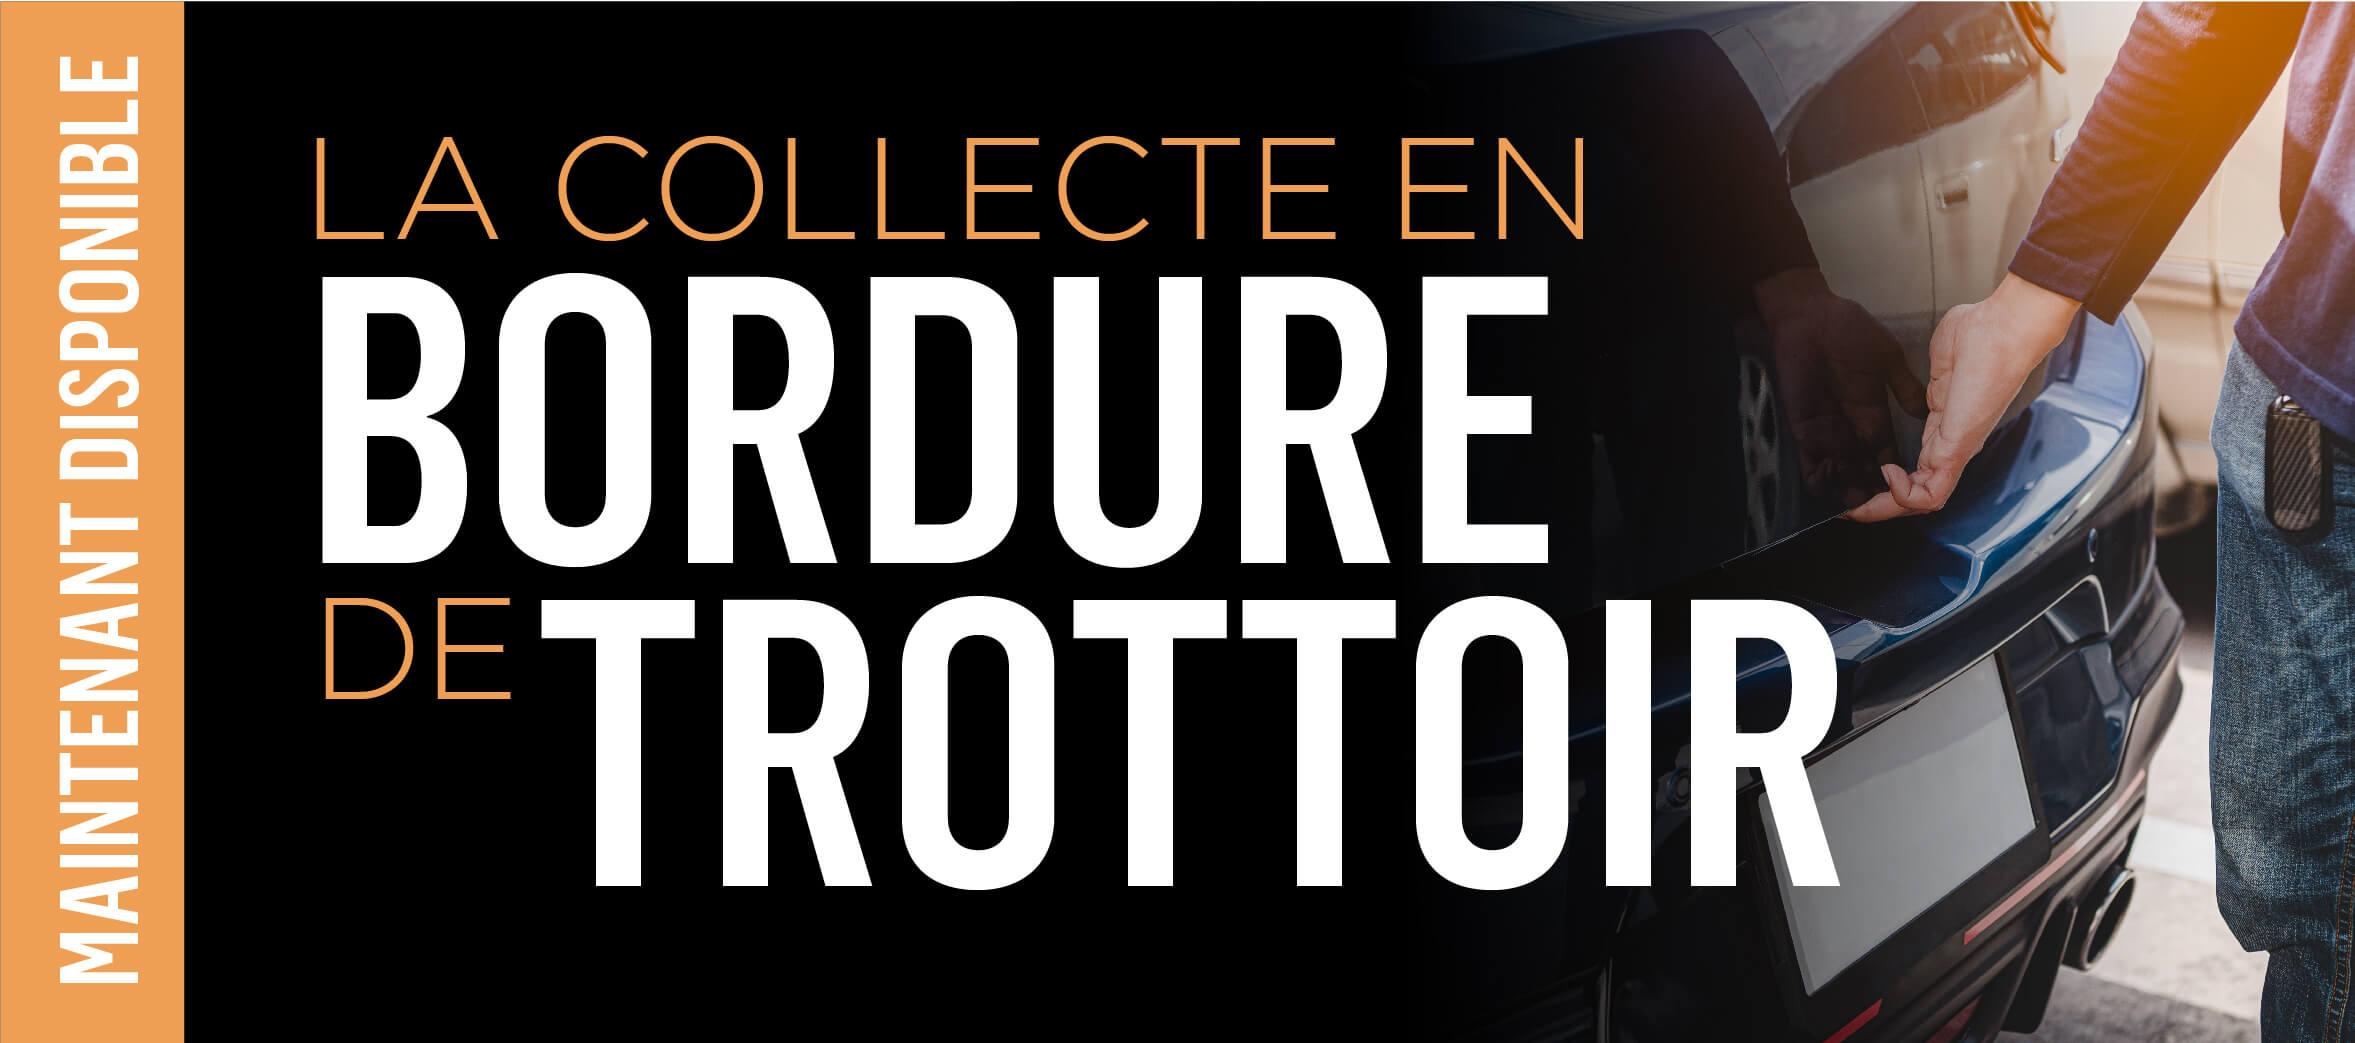 curbside-pickup-header-fr